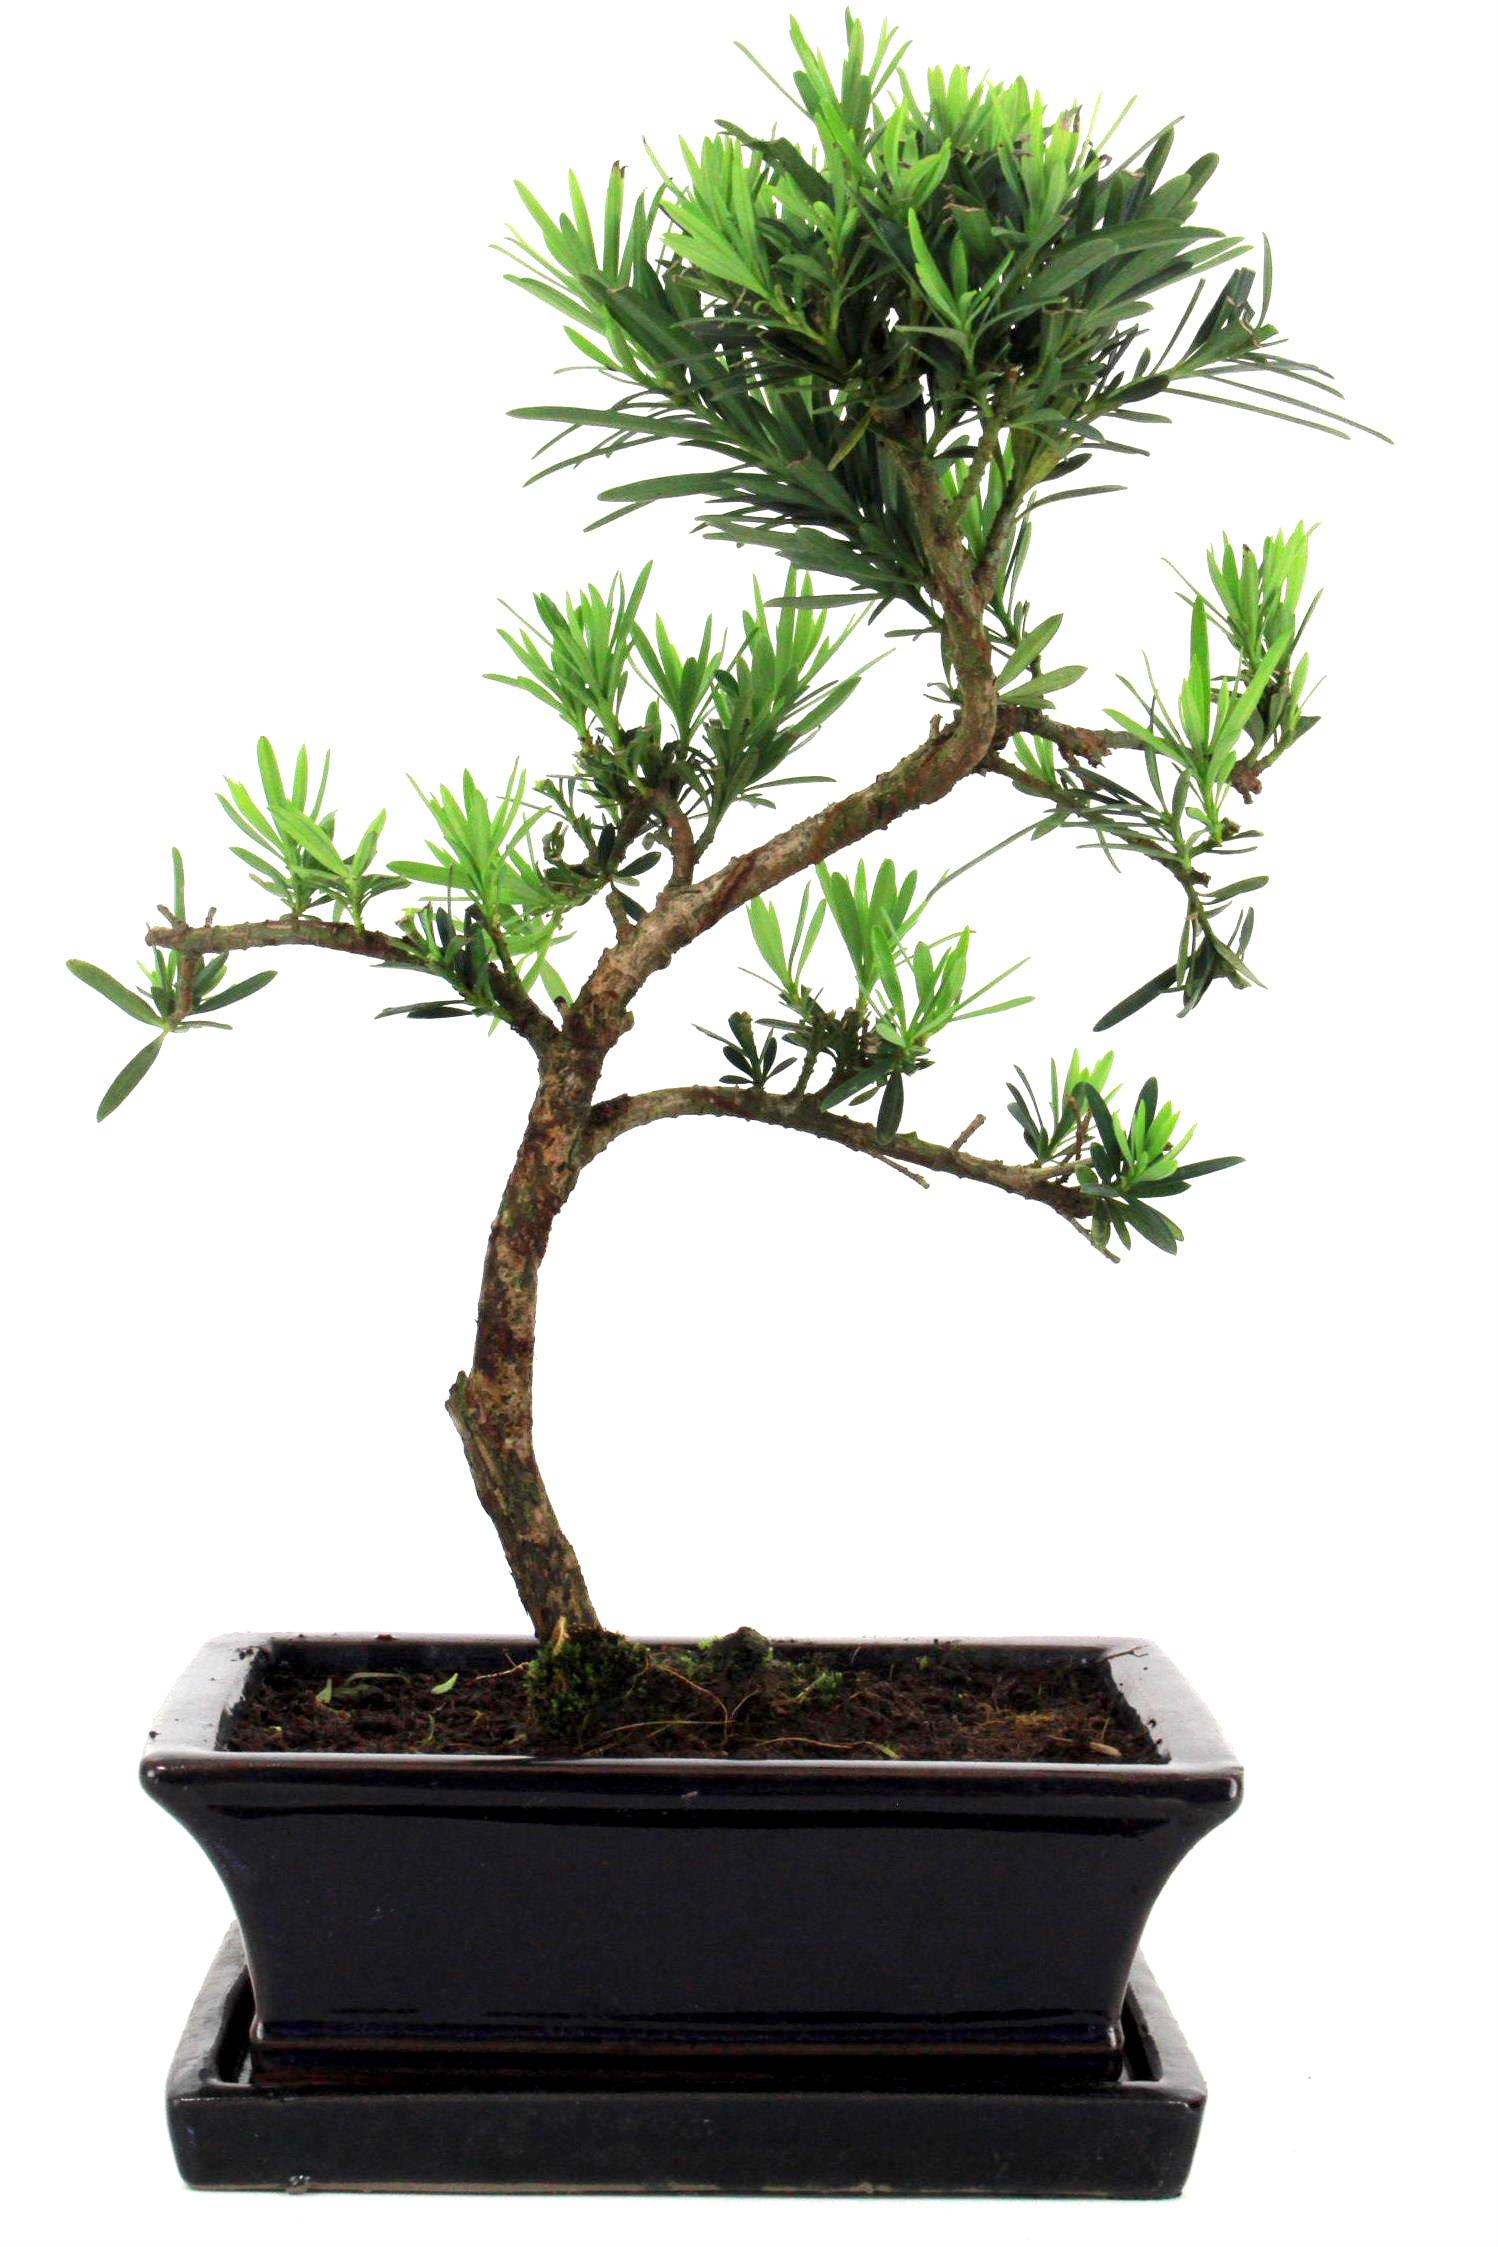 steineibe bonsai 35 40 cm 195 bei oyaki bonsai kaufen. Black Bedroom Furniture Sets. Home Design Ideas